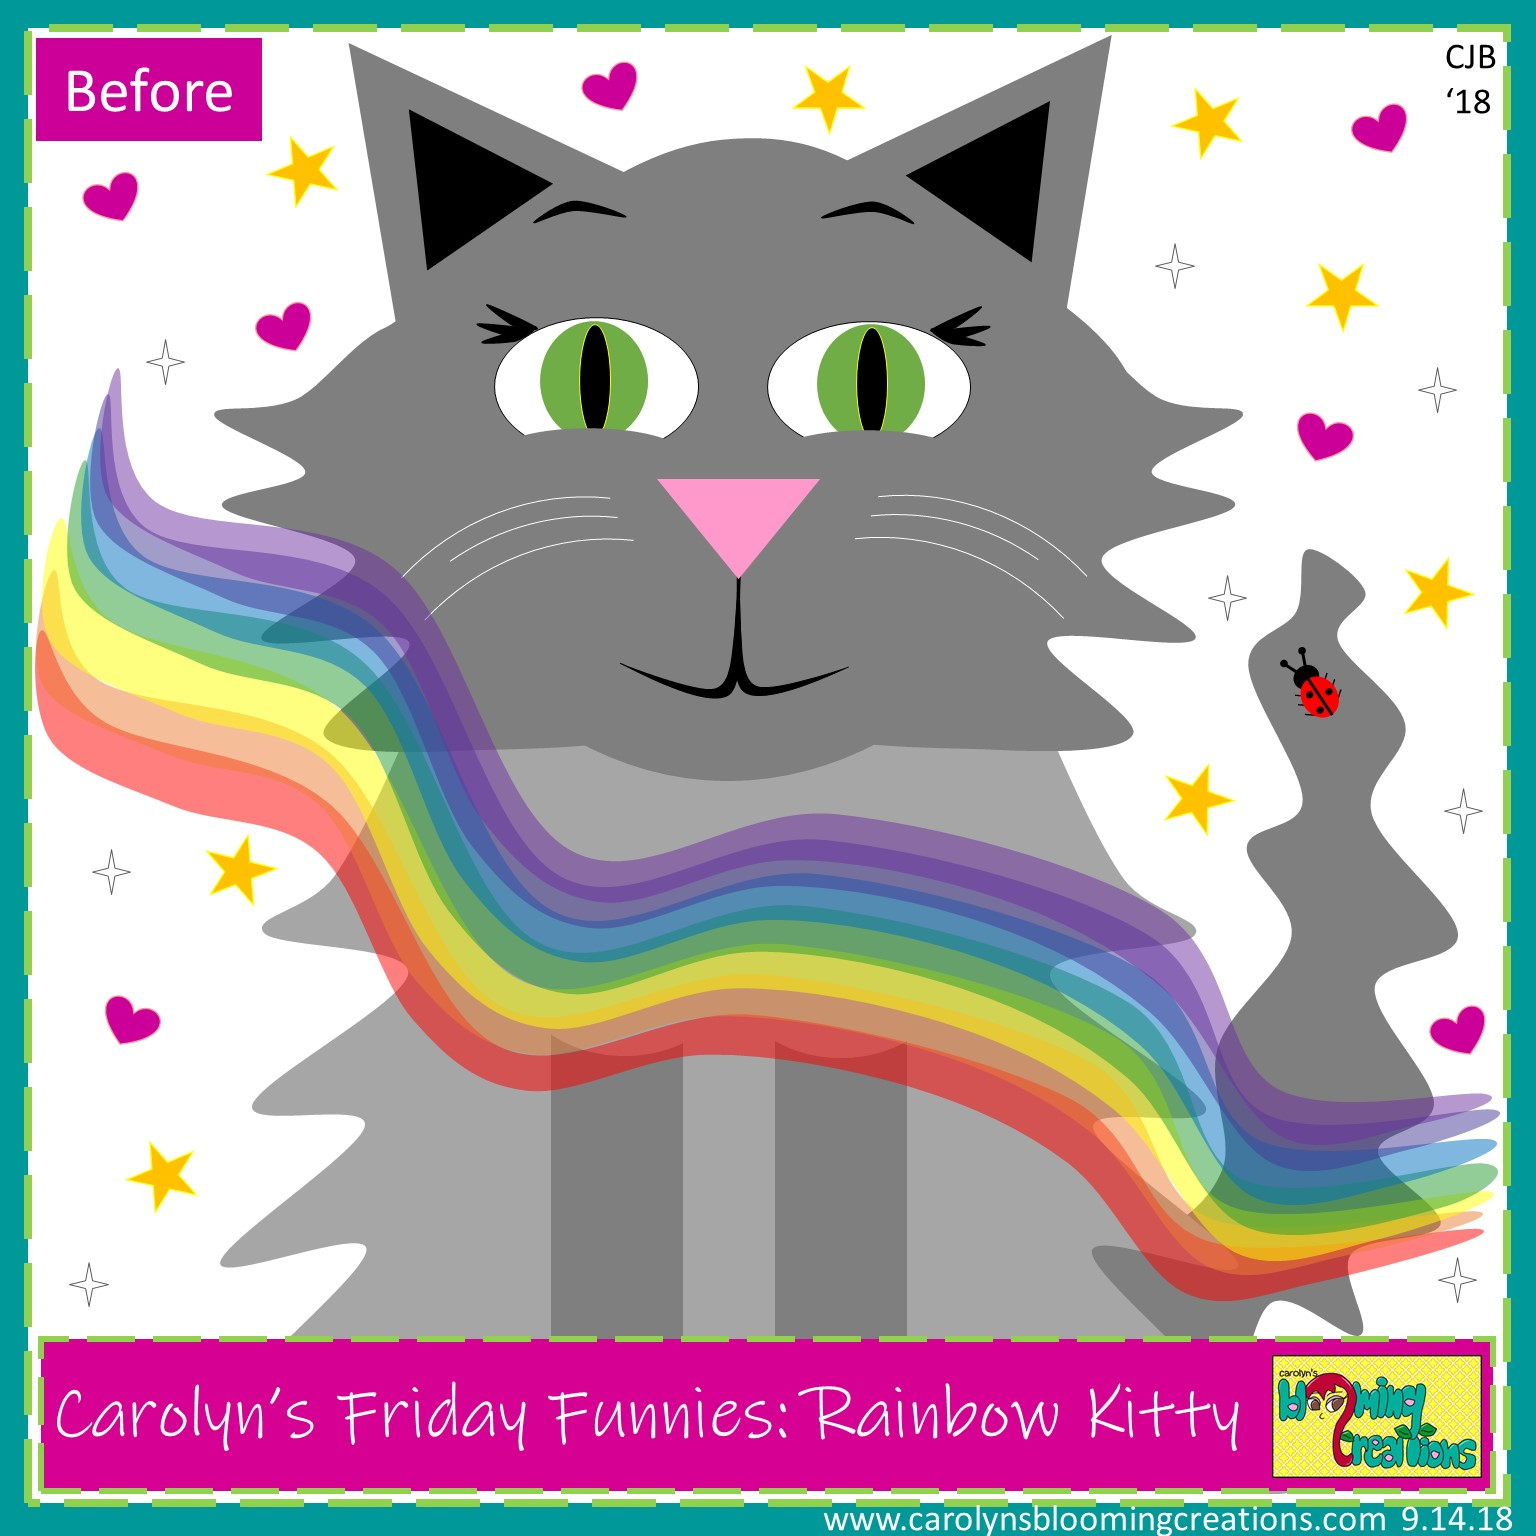 Carolyn Braden Rainbow Kitty Before.jpg